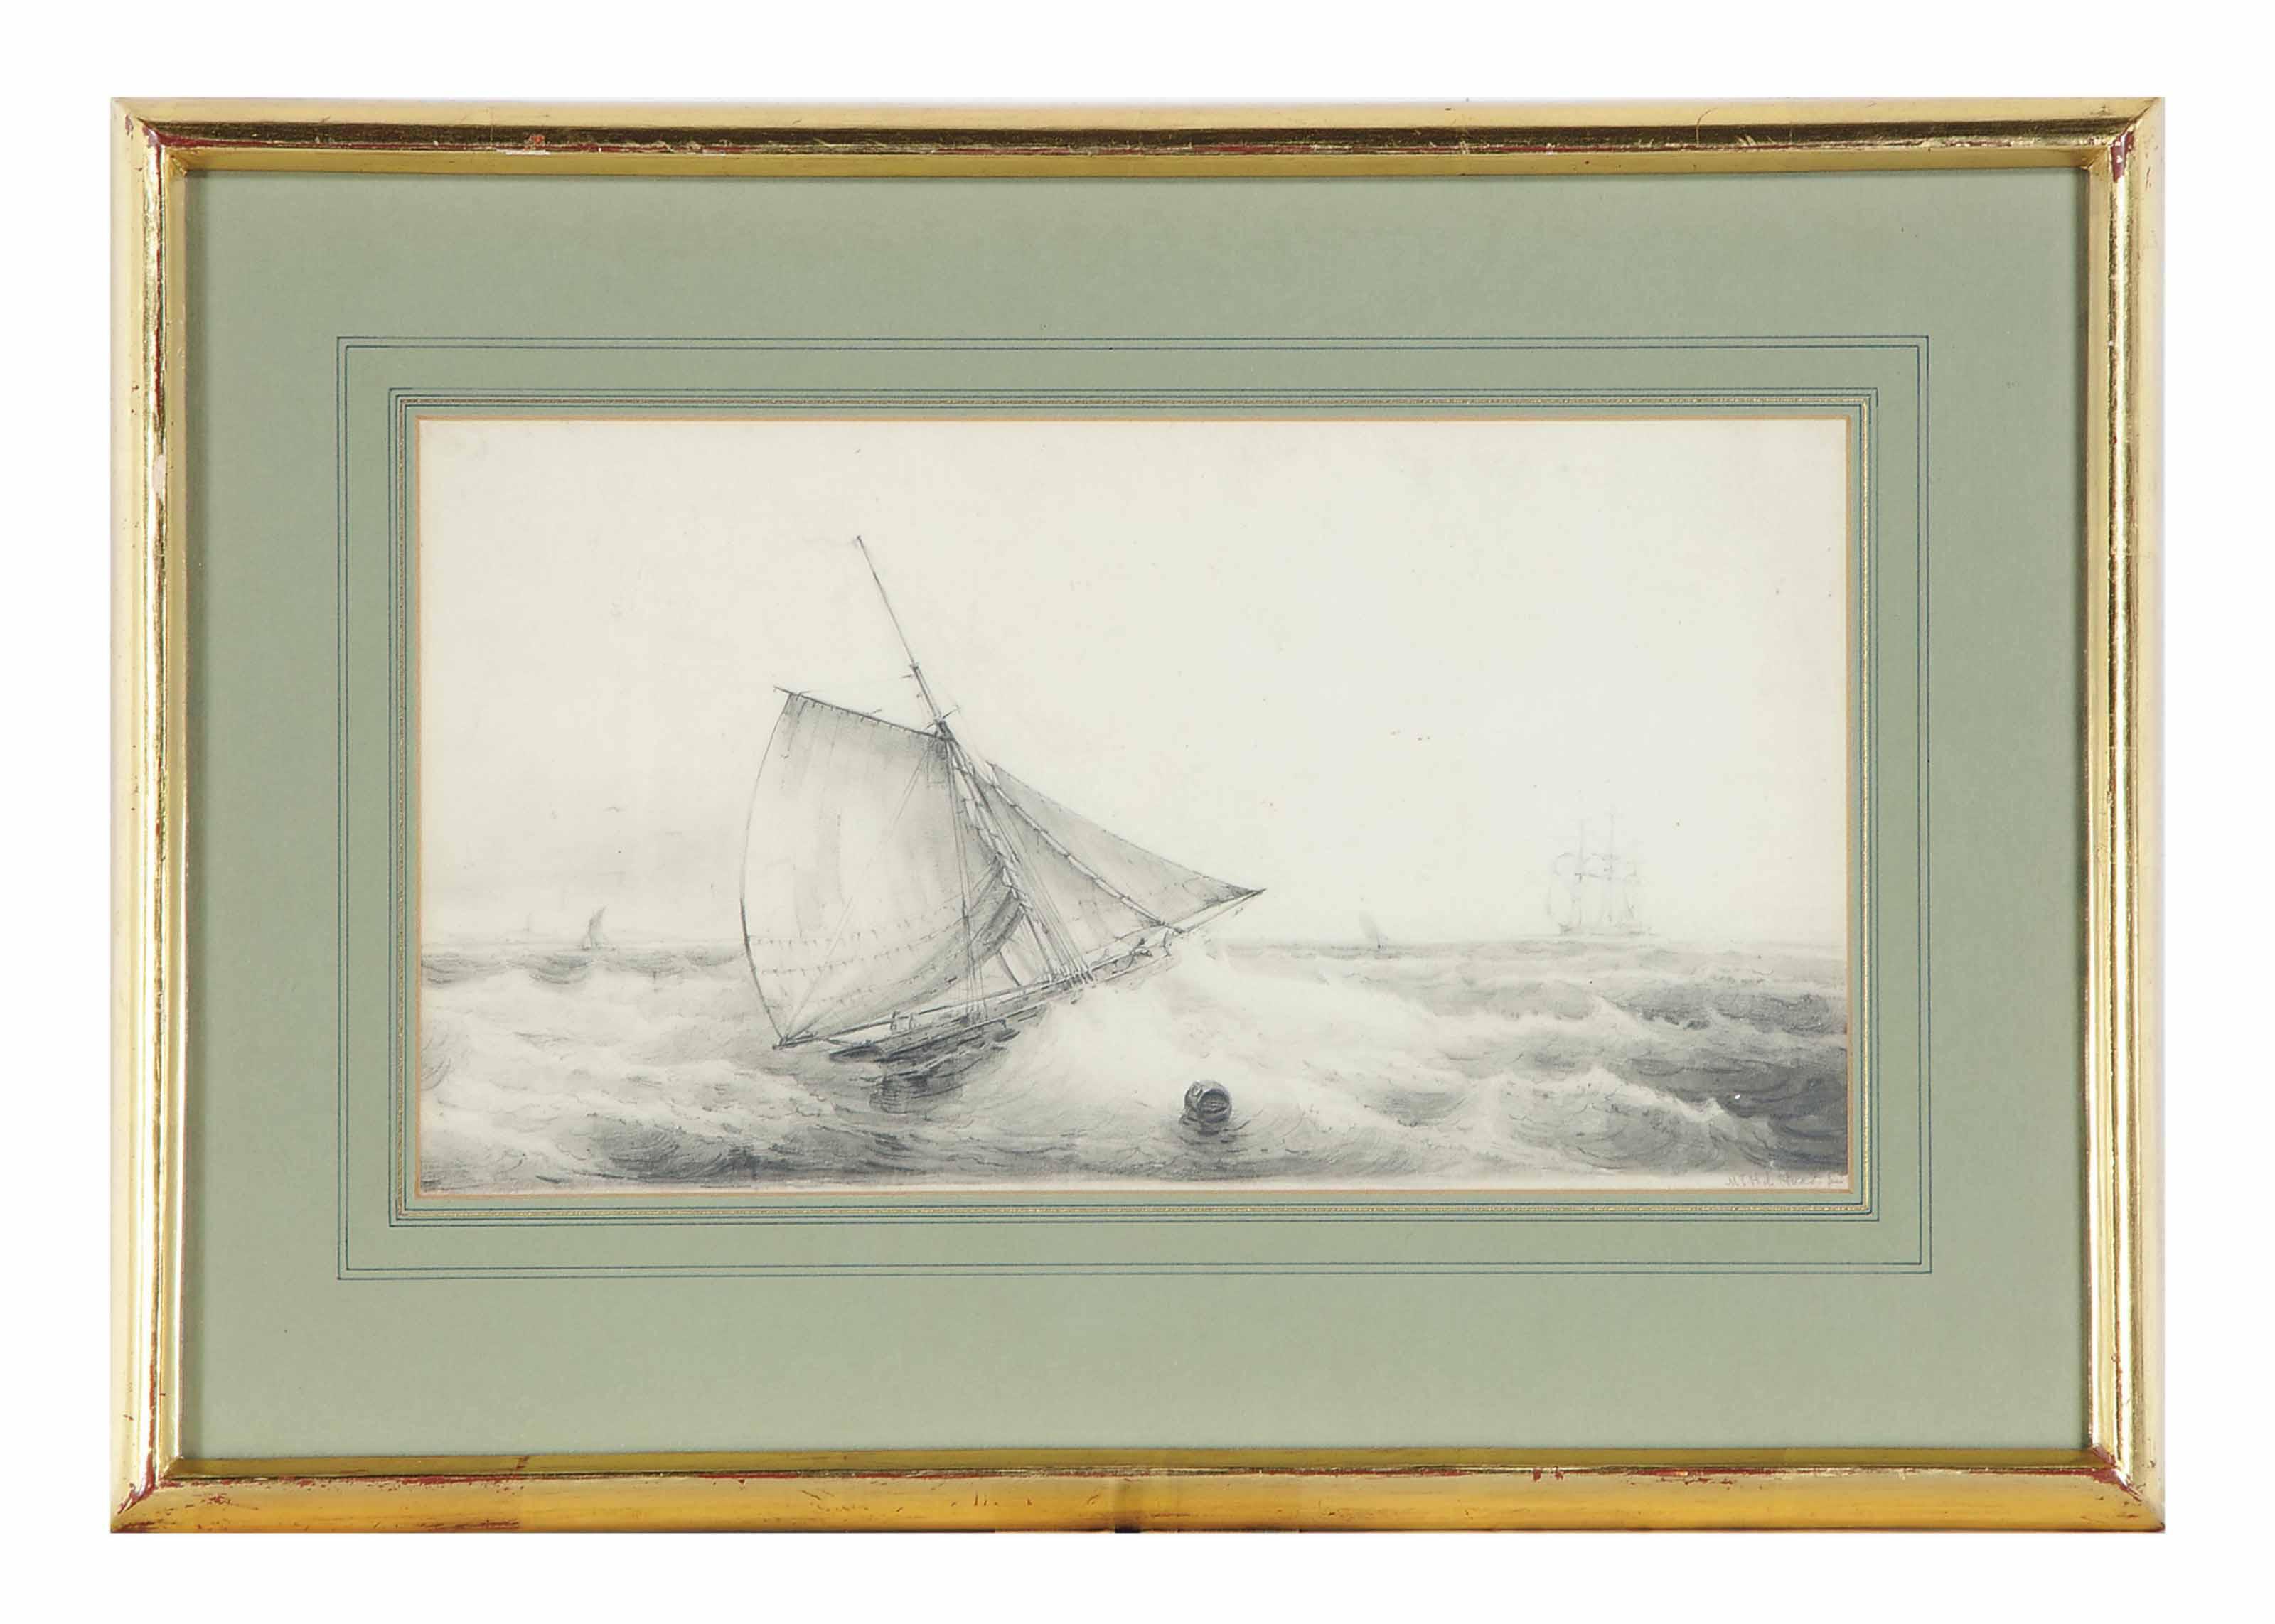 A boat in rough seas